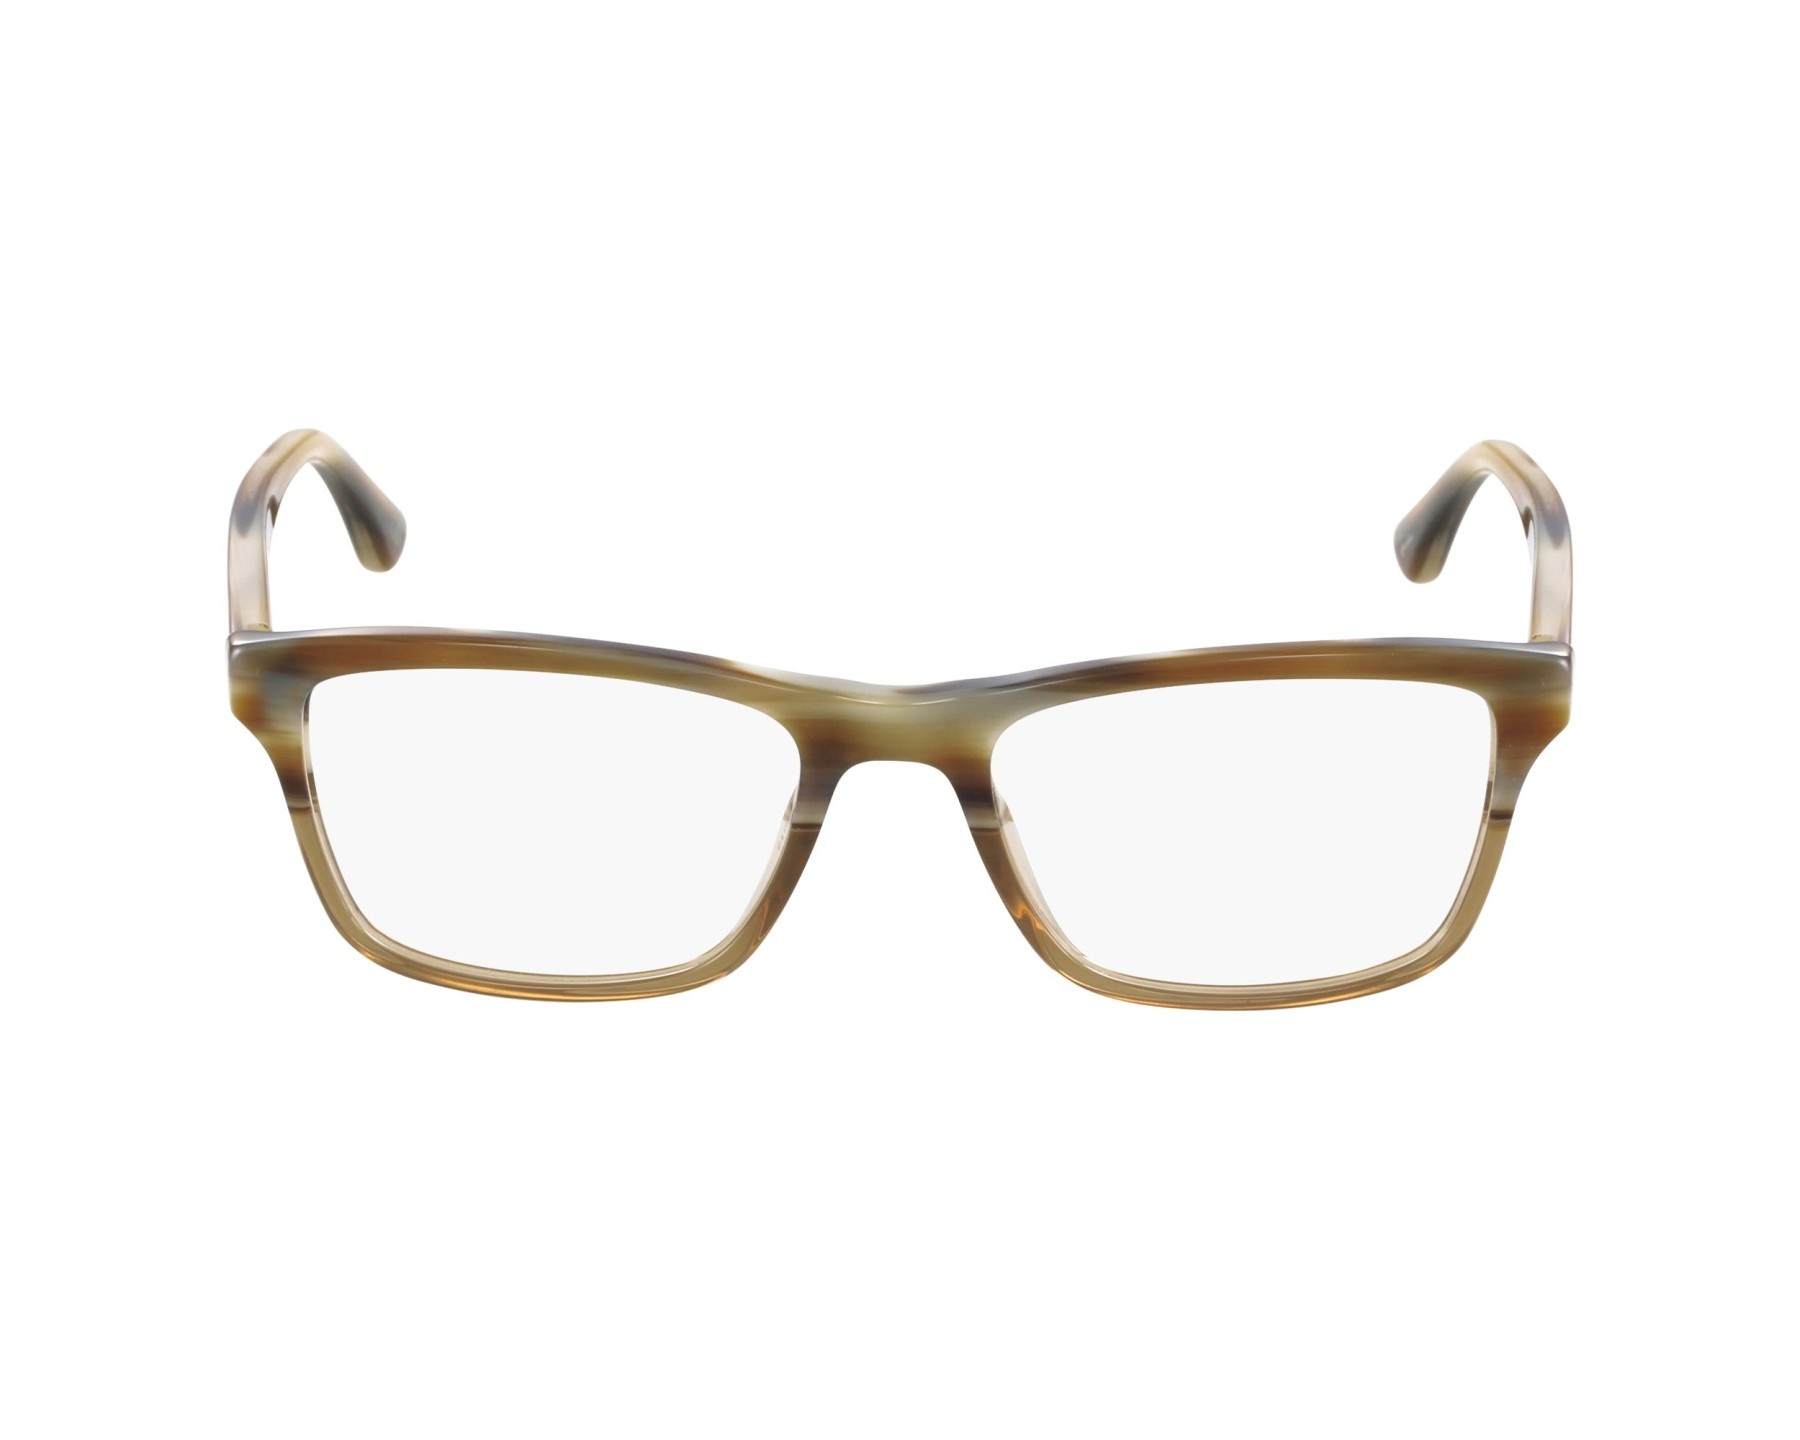 297df87ac6 eyeglasses Ray-Ban RX-5279 5542 55-18 Brown profile view